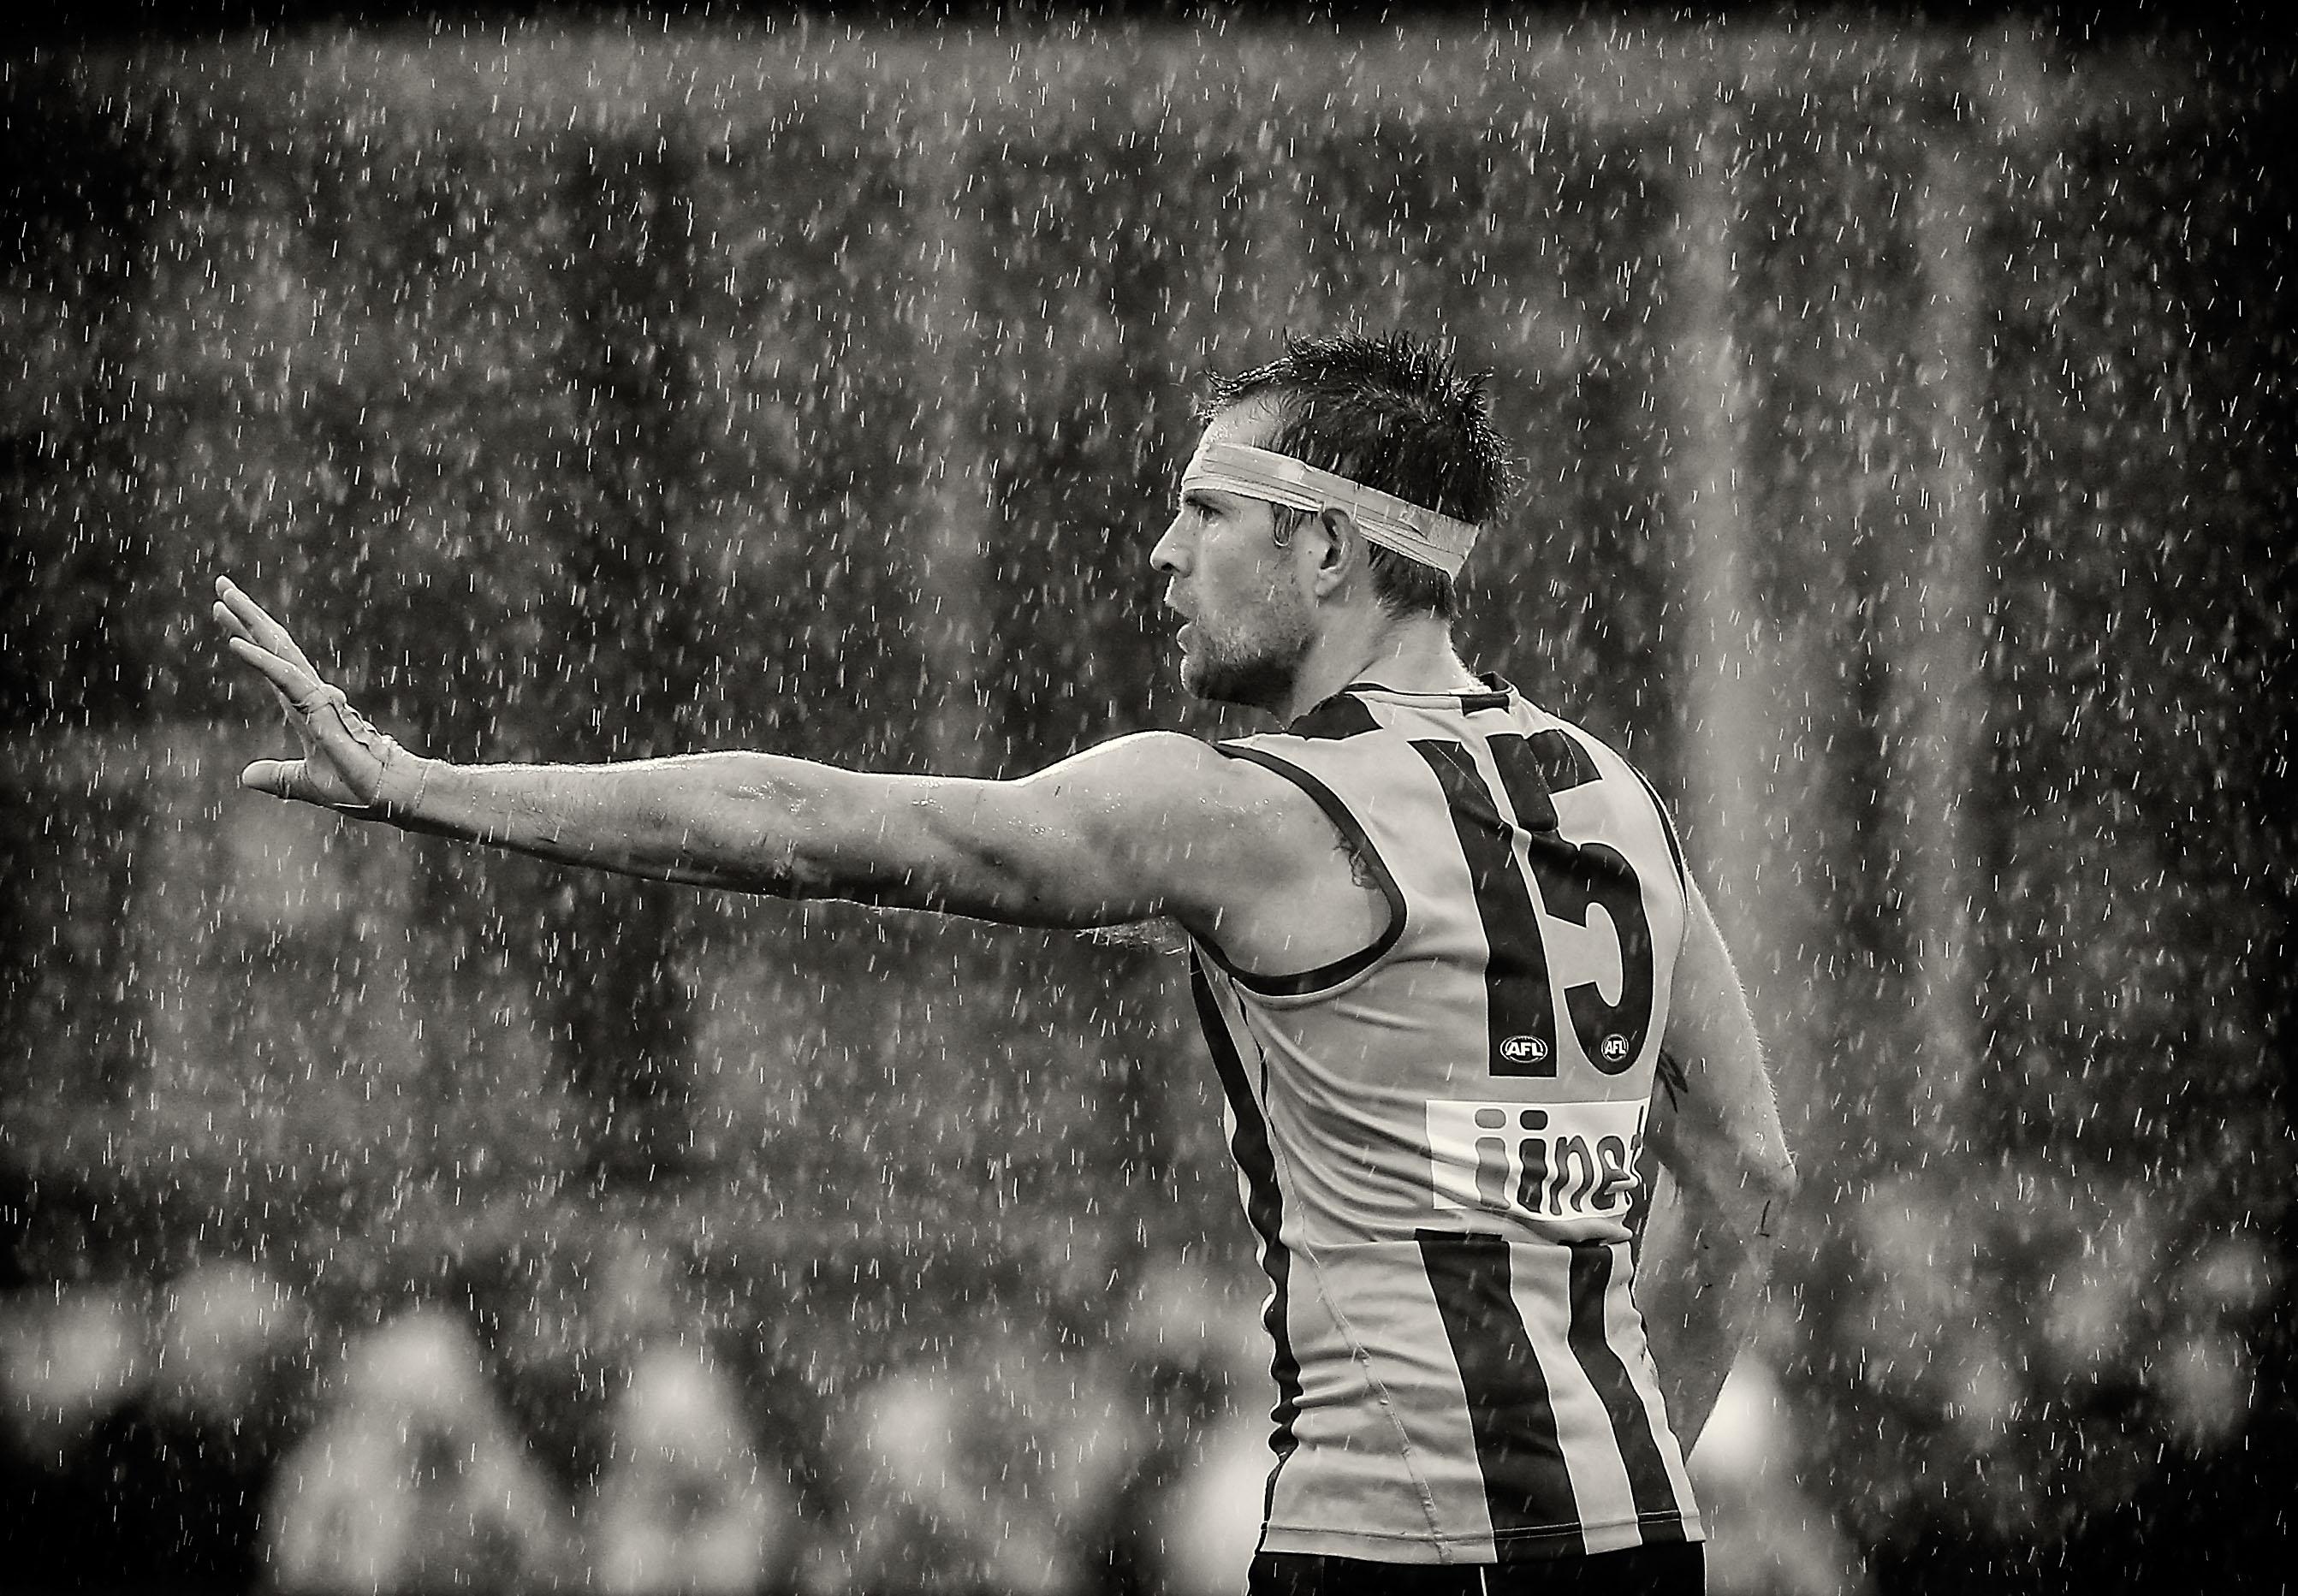 AFL 2014 Rd 15 - Hawthorn v Gold Coast